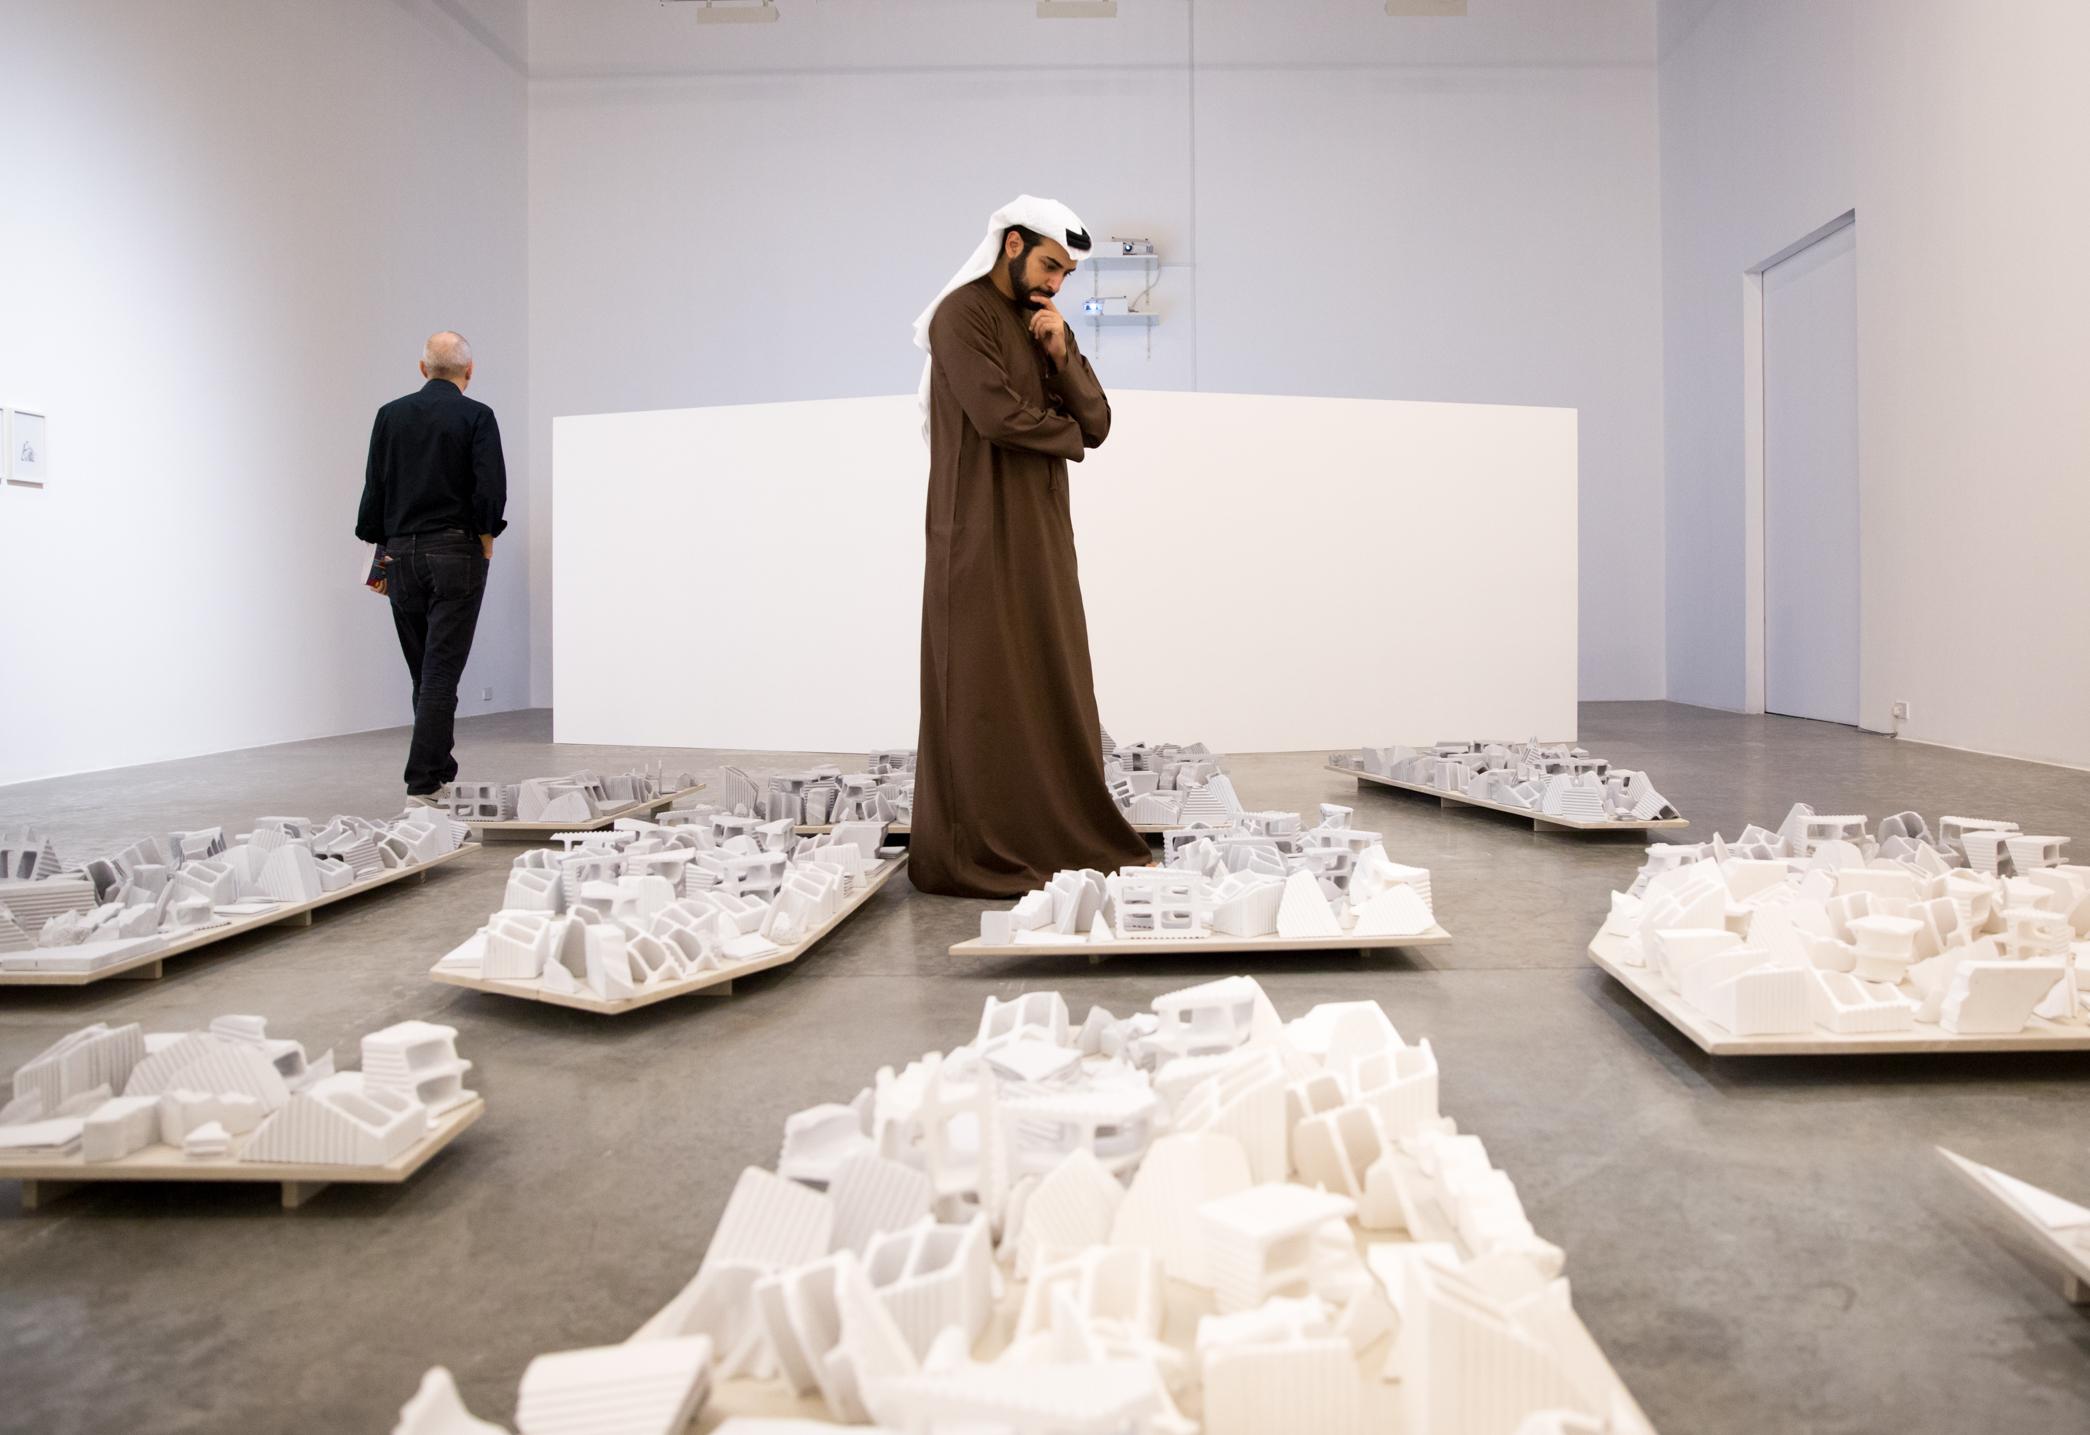 Installation view at Alserkal Avenue during Dubai Art Week